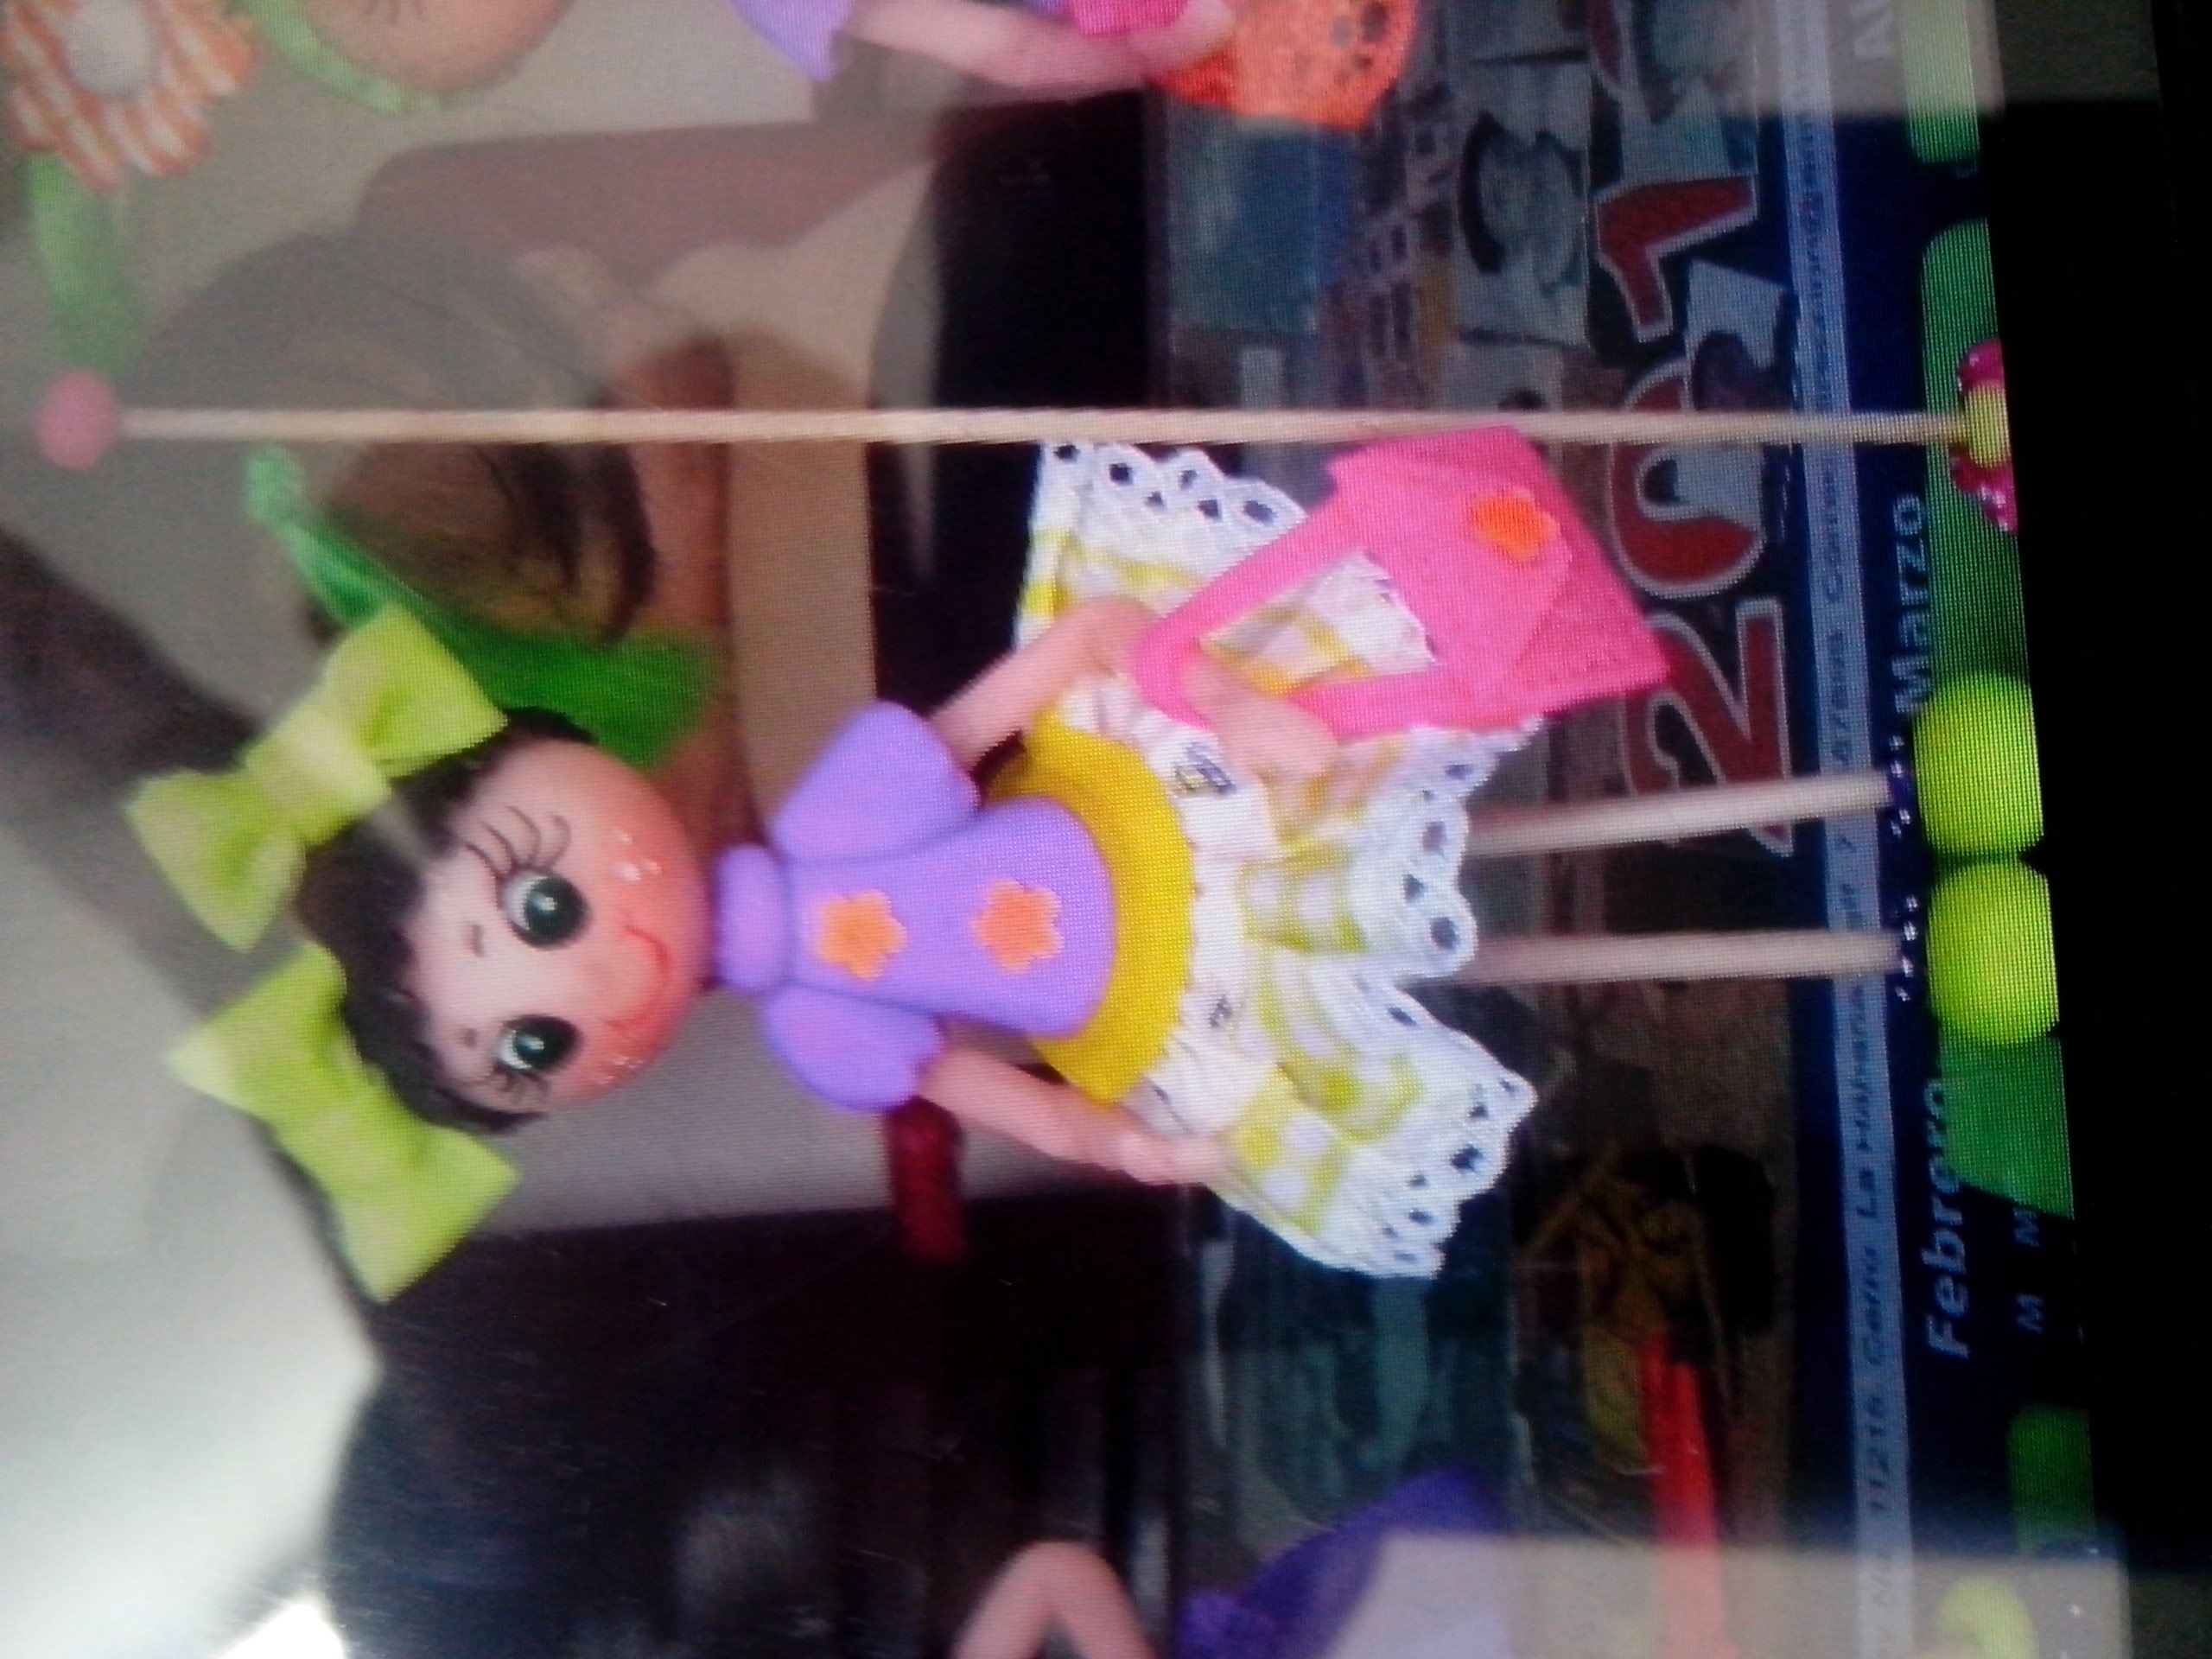 Pin by yamy on mis muñecas de porcelana fria   Pinterest